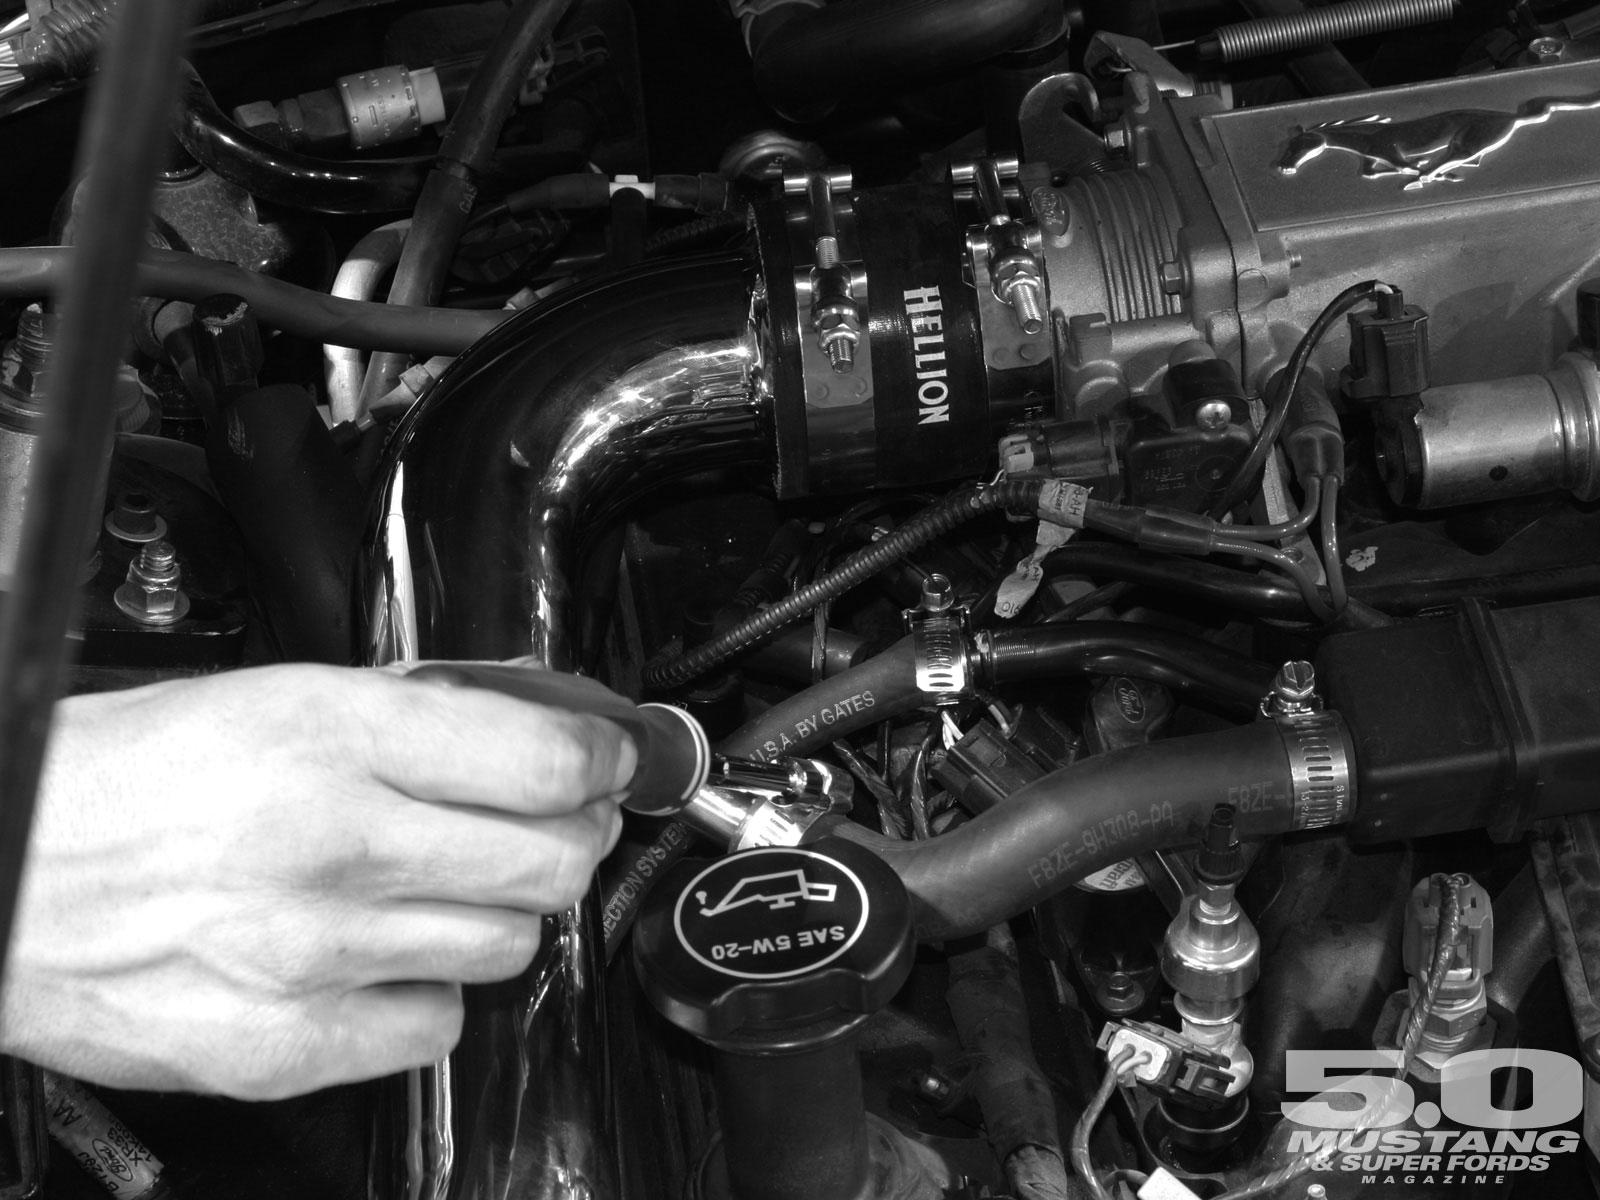 M5lp 0507 31 O+hellion Power Systems Mod Motor Turbo Kit+intake Pipe